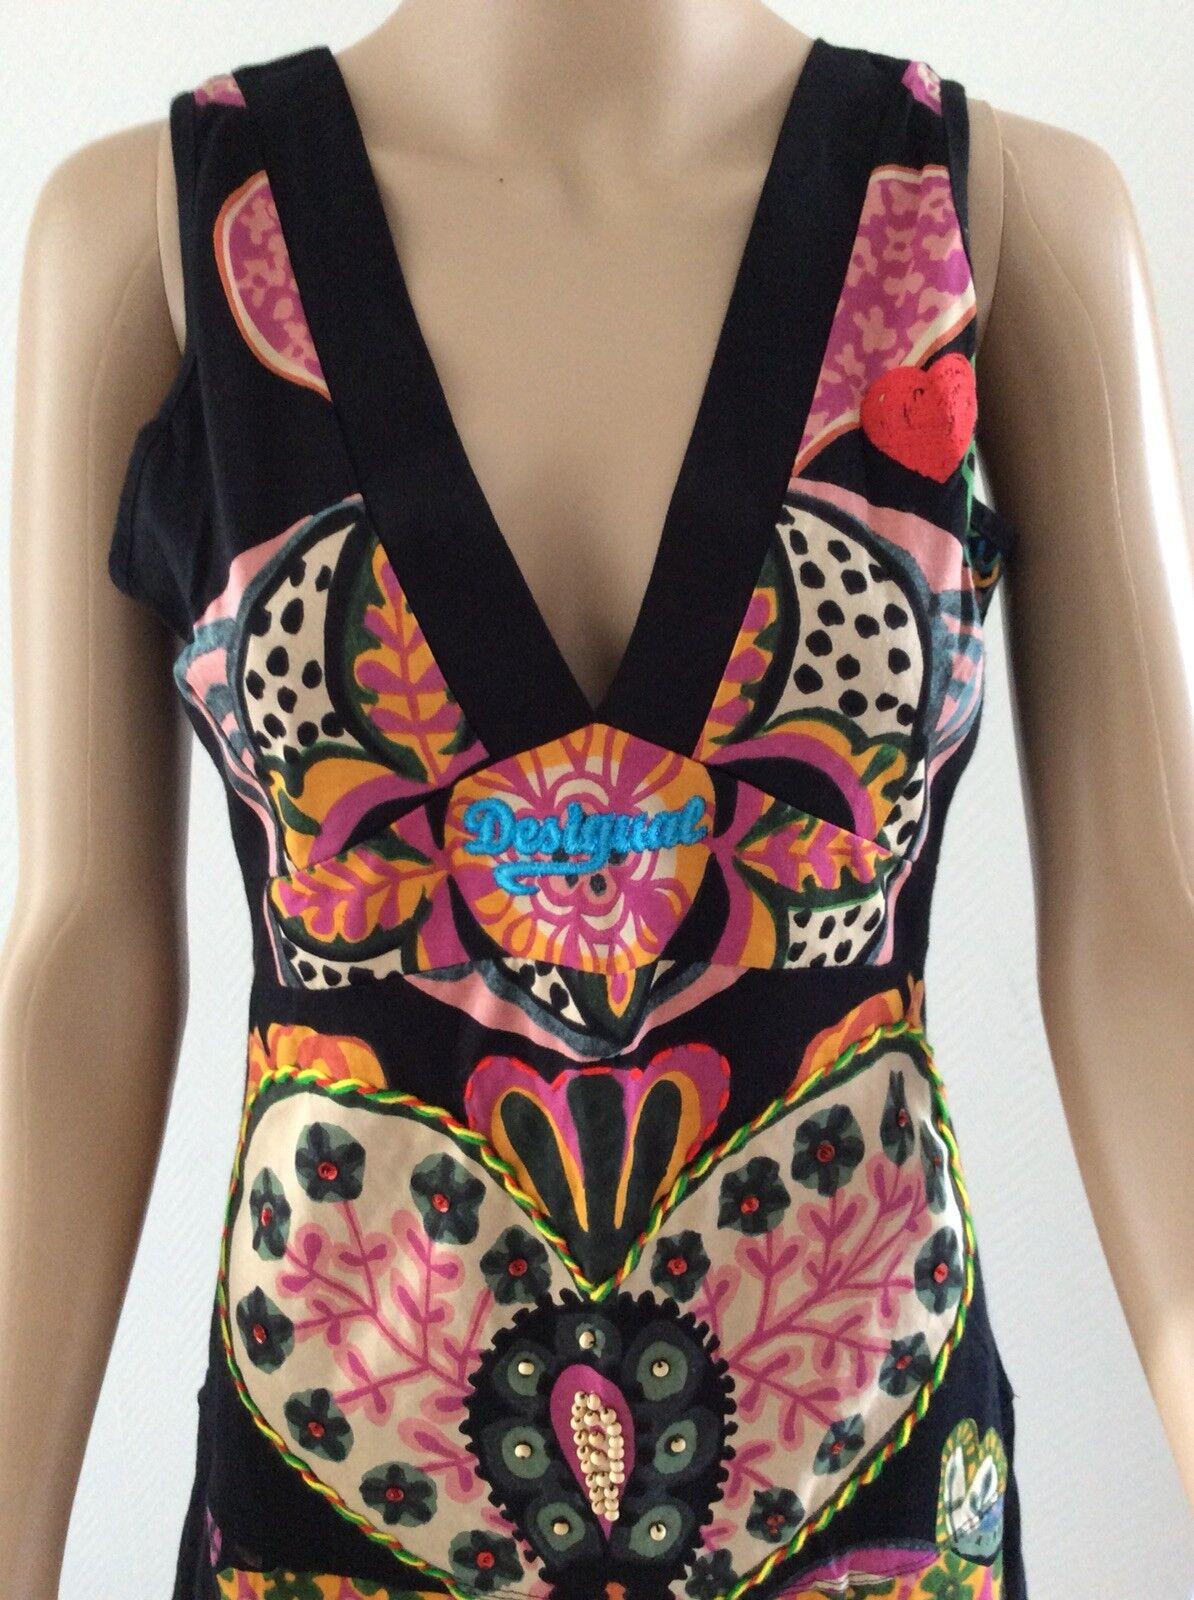 Desigual Kleid Yentes Multi Multi Multi Farbe  schwarz Damen Kleid Gr 38 M NEU 1f63a1